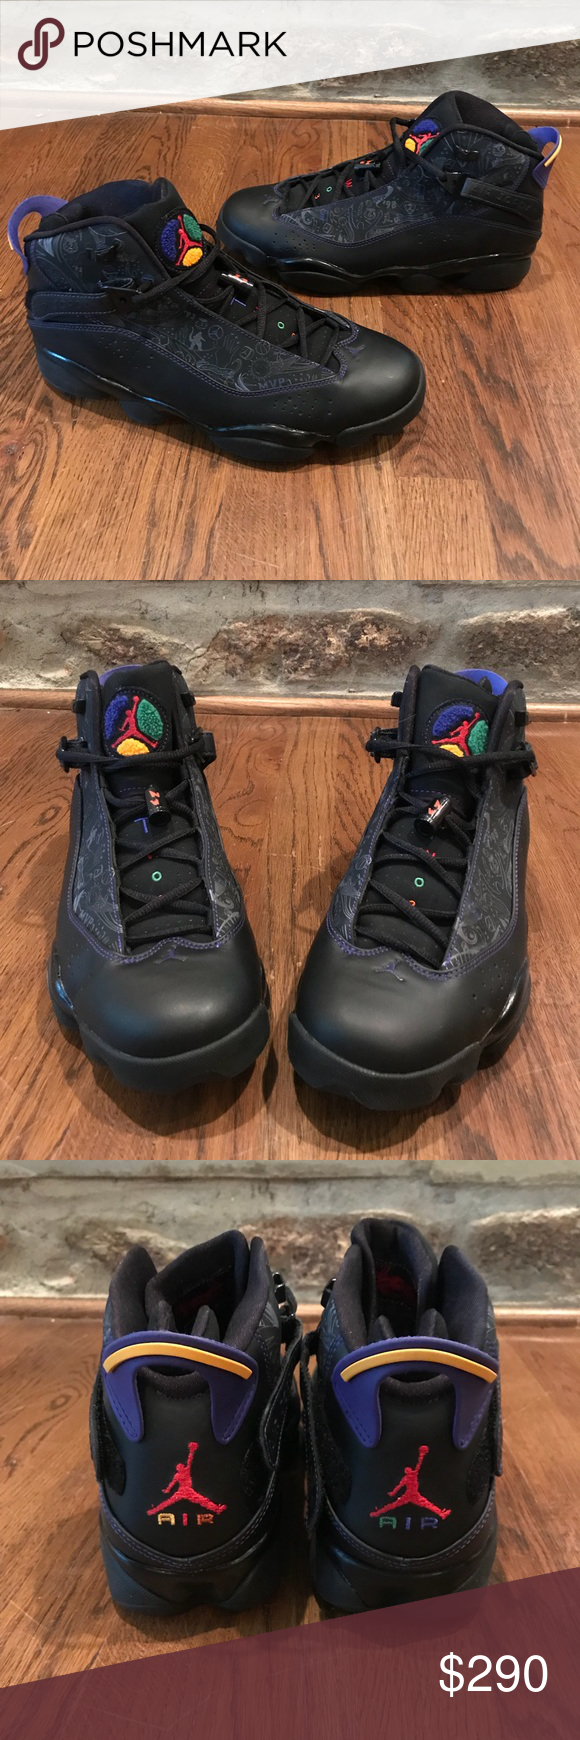 Extremely RARE Jordan 6 Rings Colorway